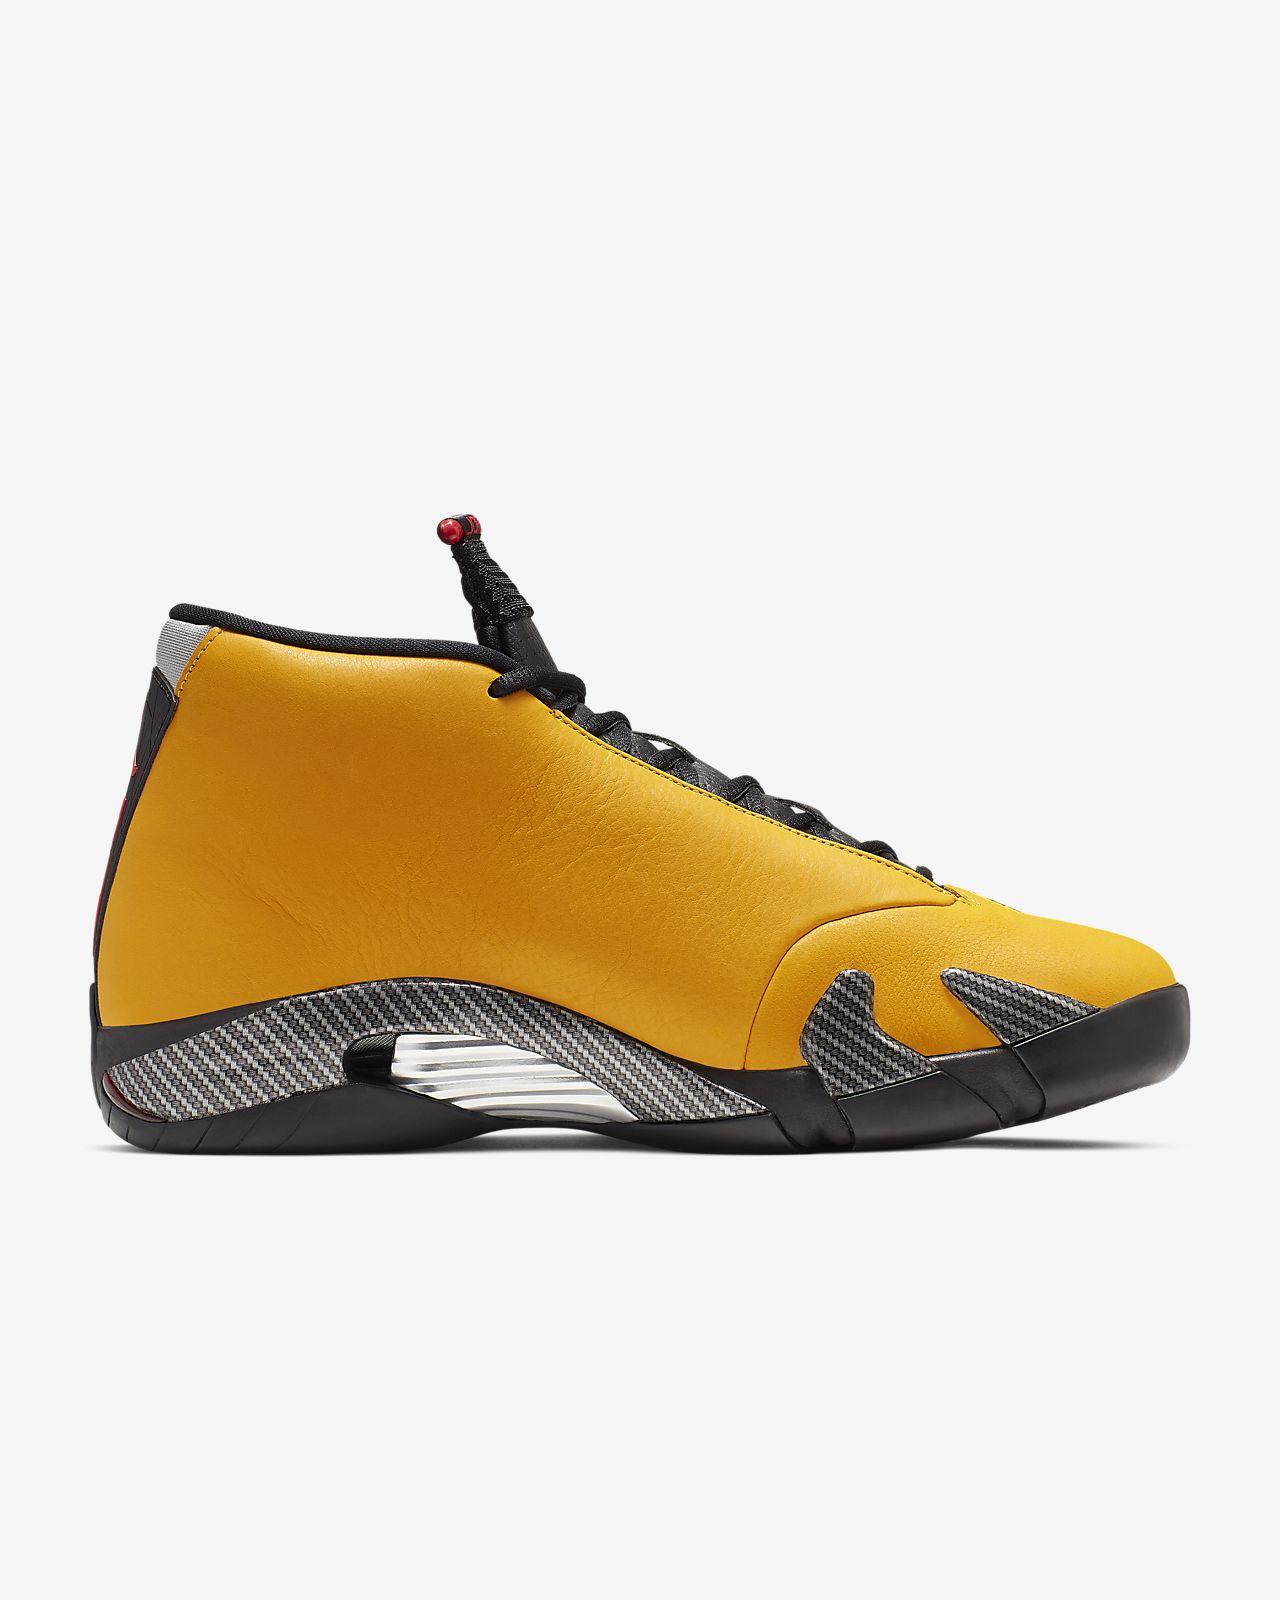 newest 3c3fd bec31 ... Air Jordan 14 Retro SE Men s Shoe